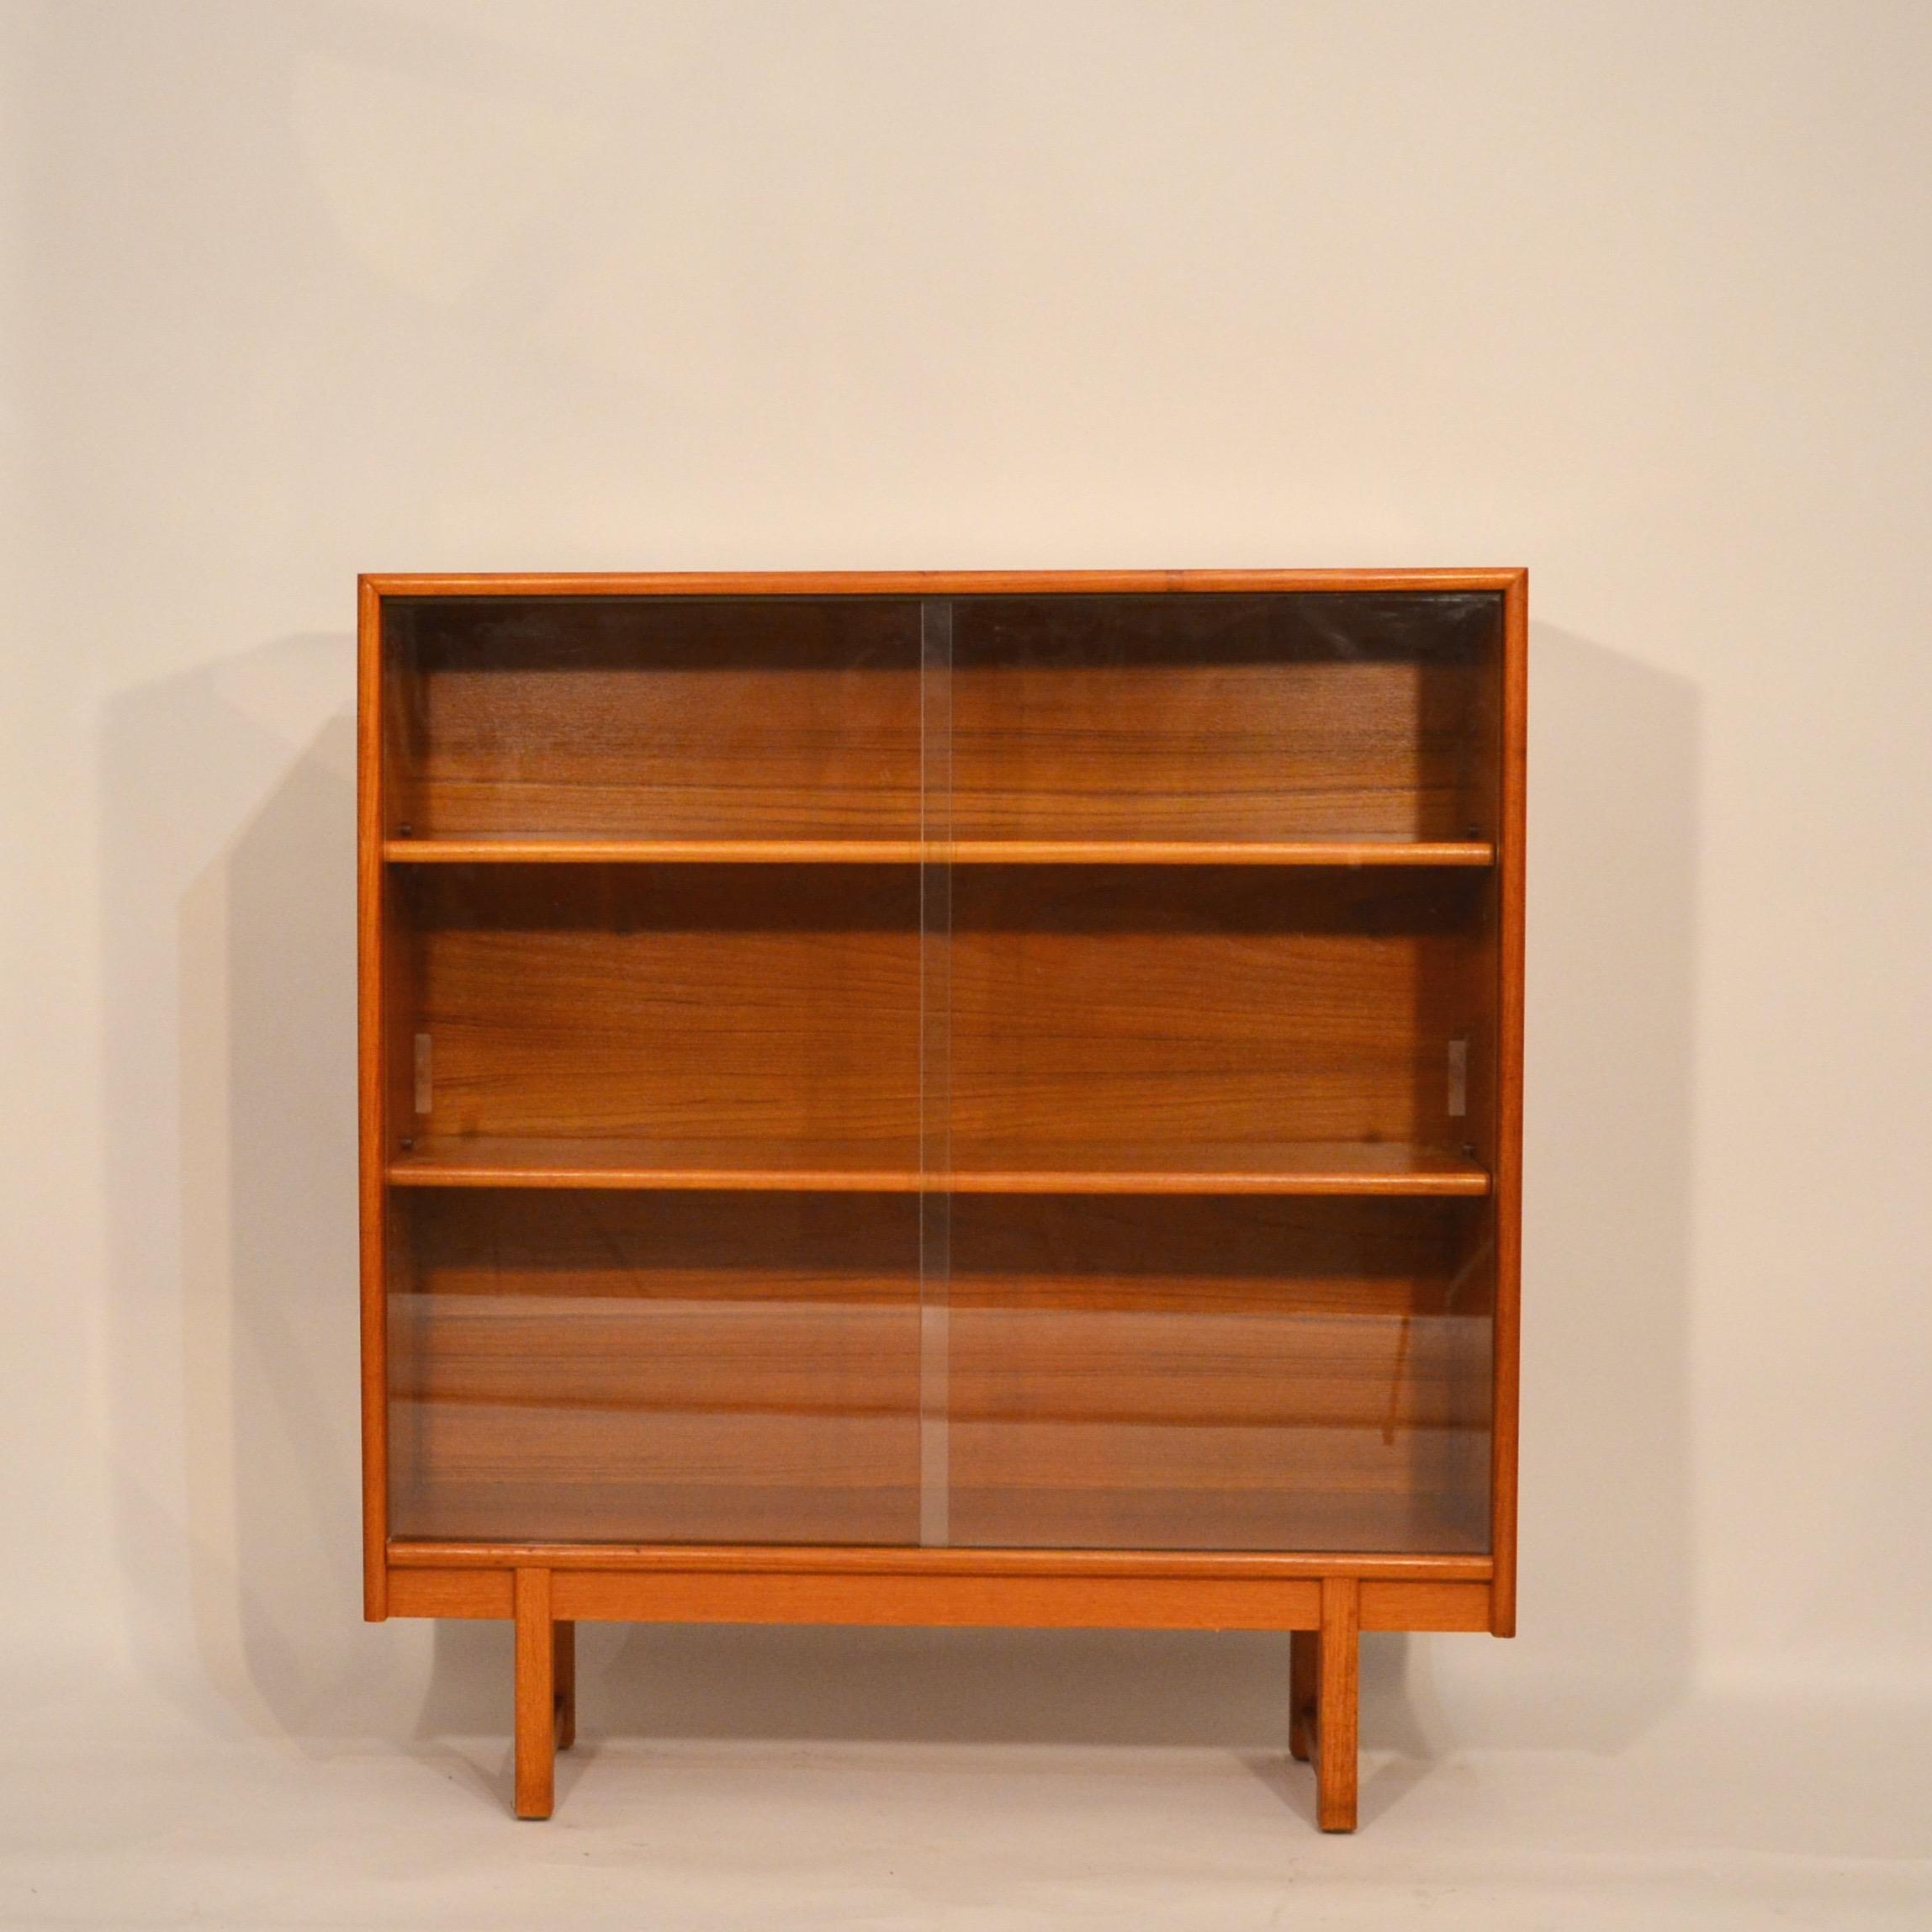 biblioth que ann es 60 bindiesbindies. Black Bedroom Furniture Sets. Home Design Ideas